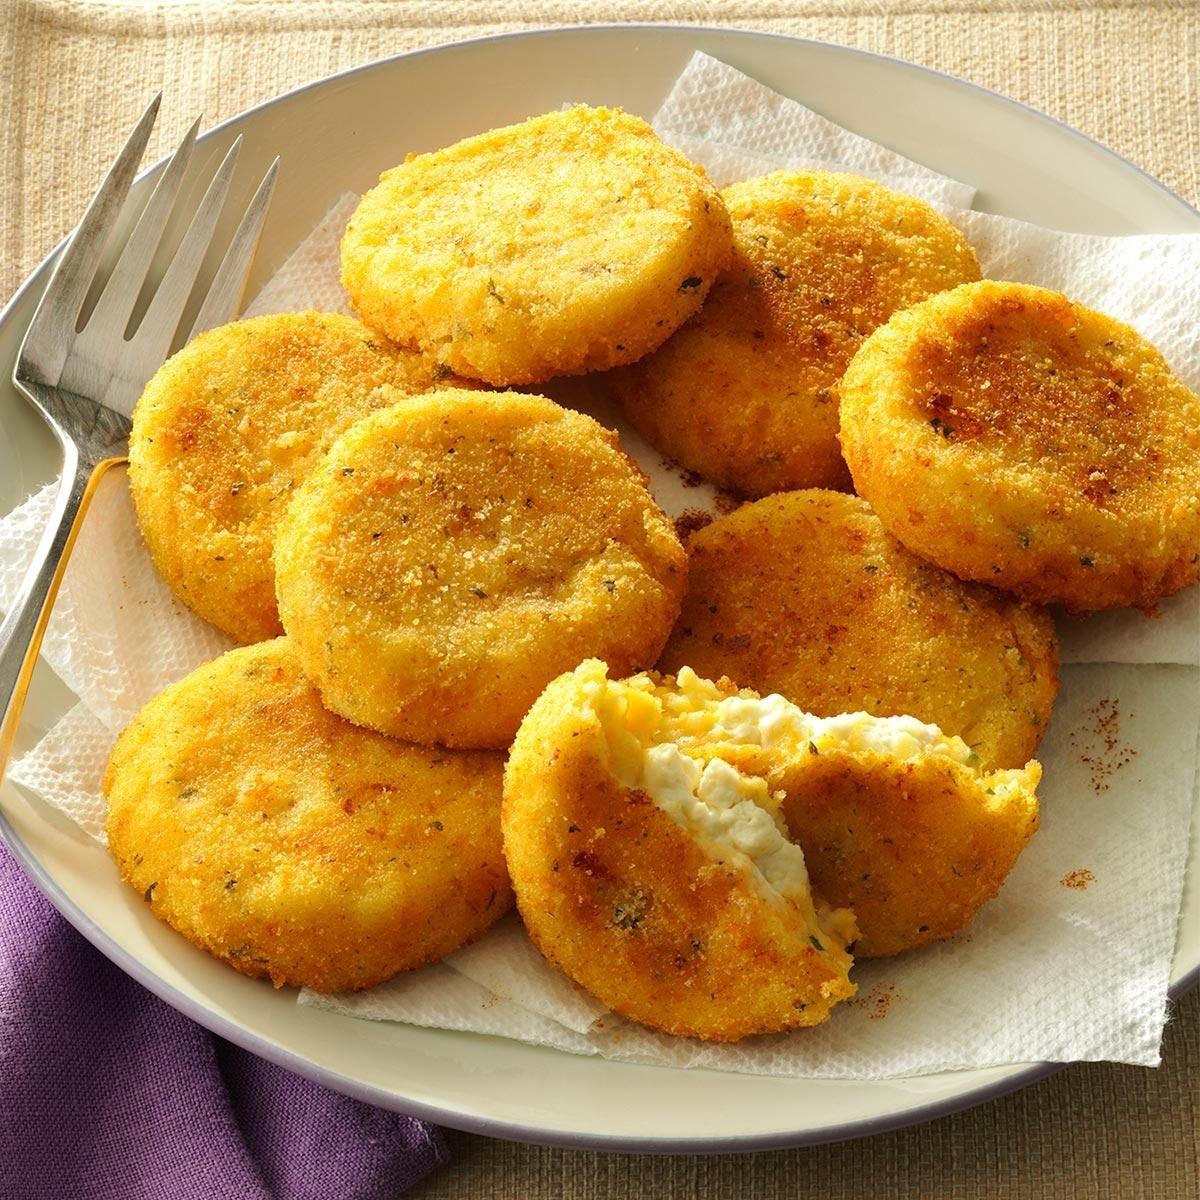 Loaded stuffed potato pancakes recipe taste of home